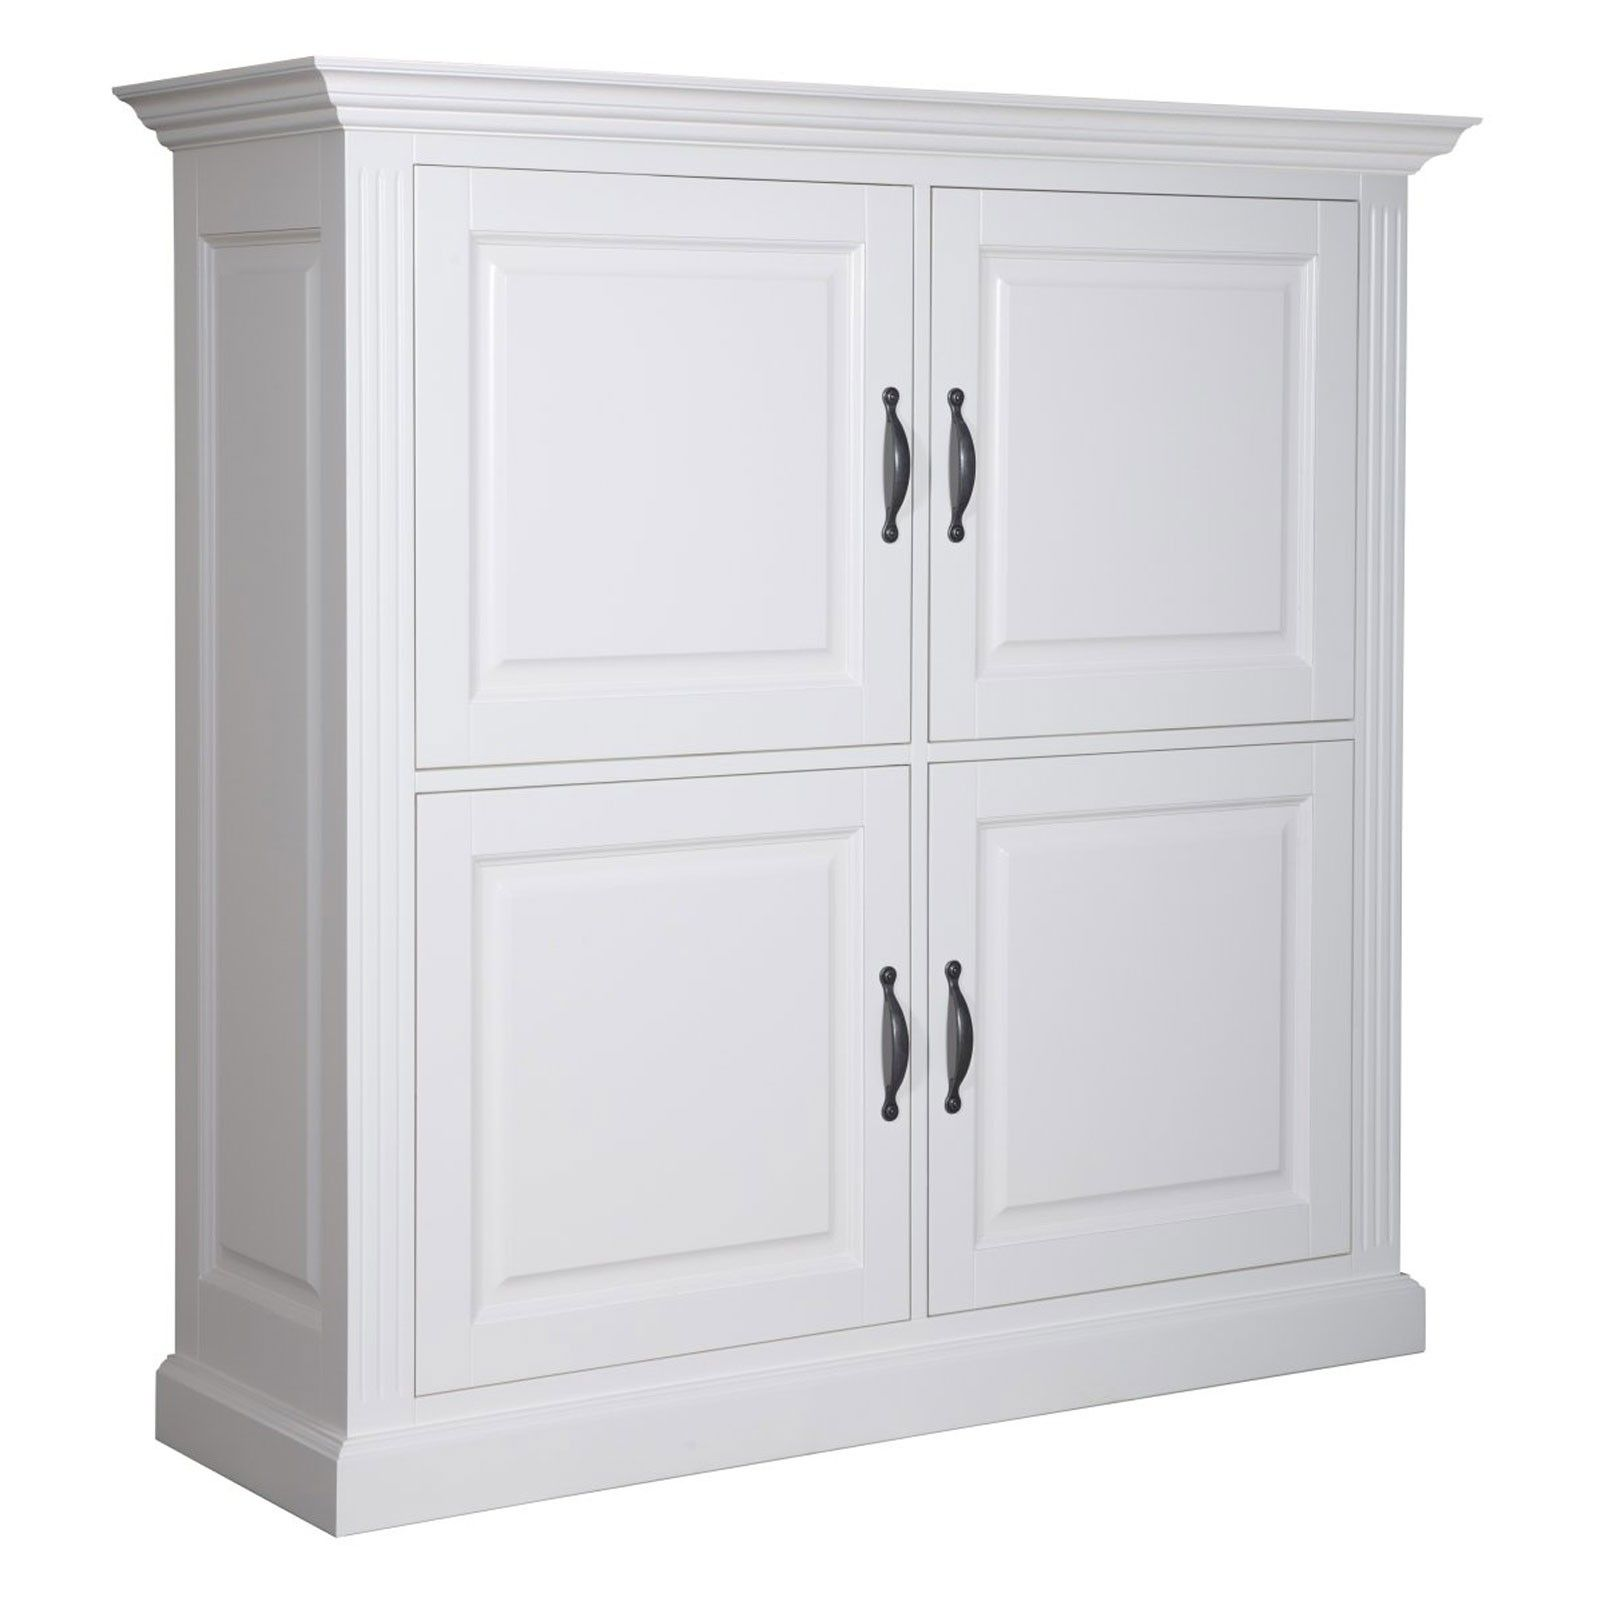 "Cabinet 4 portes ""Chic"" - achat cabinet blanc"